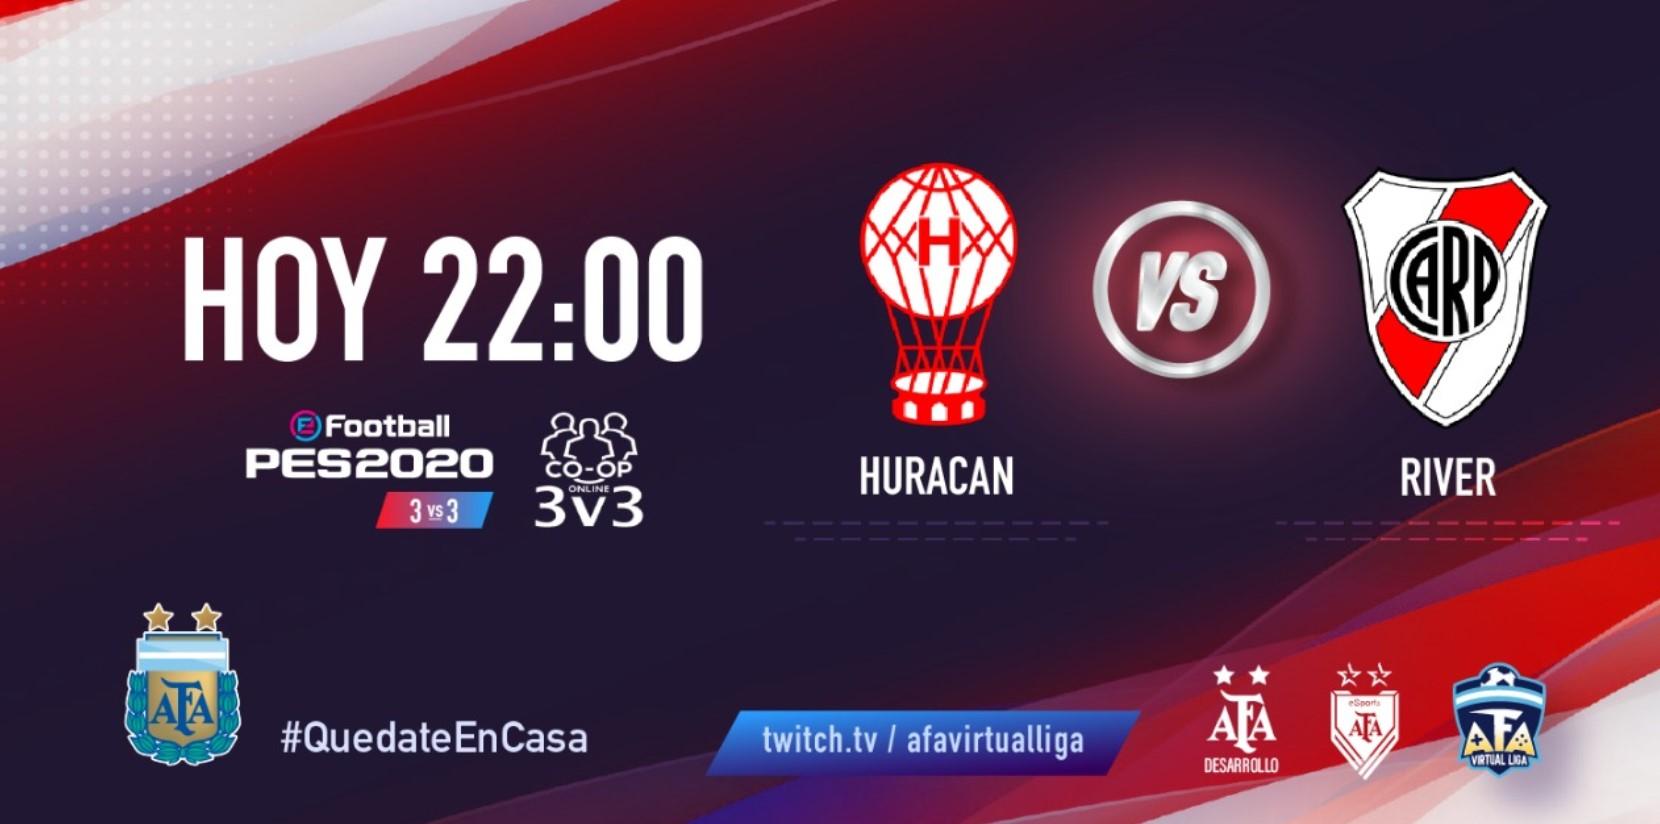 [FINAL] River Plate y Huracán definen el primer finalista del torneo 3 vs. 3 de AFA Virtual Liga